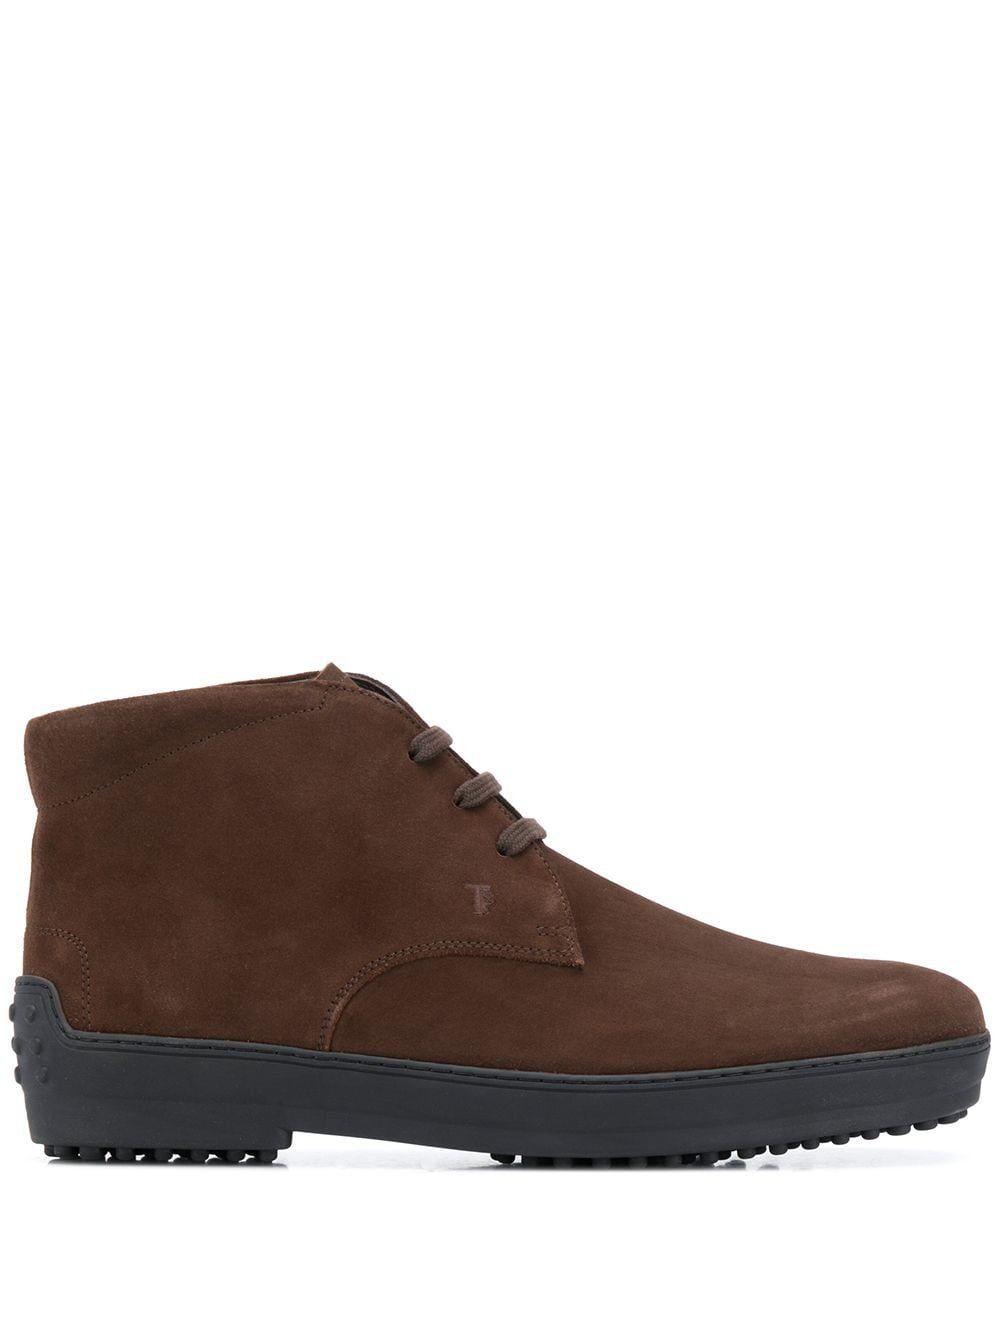 Tod's stivali marrone